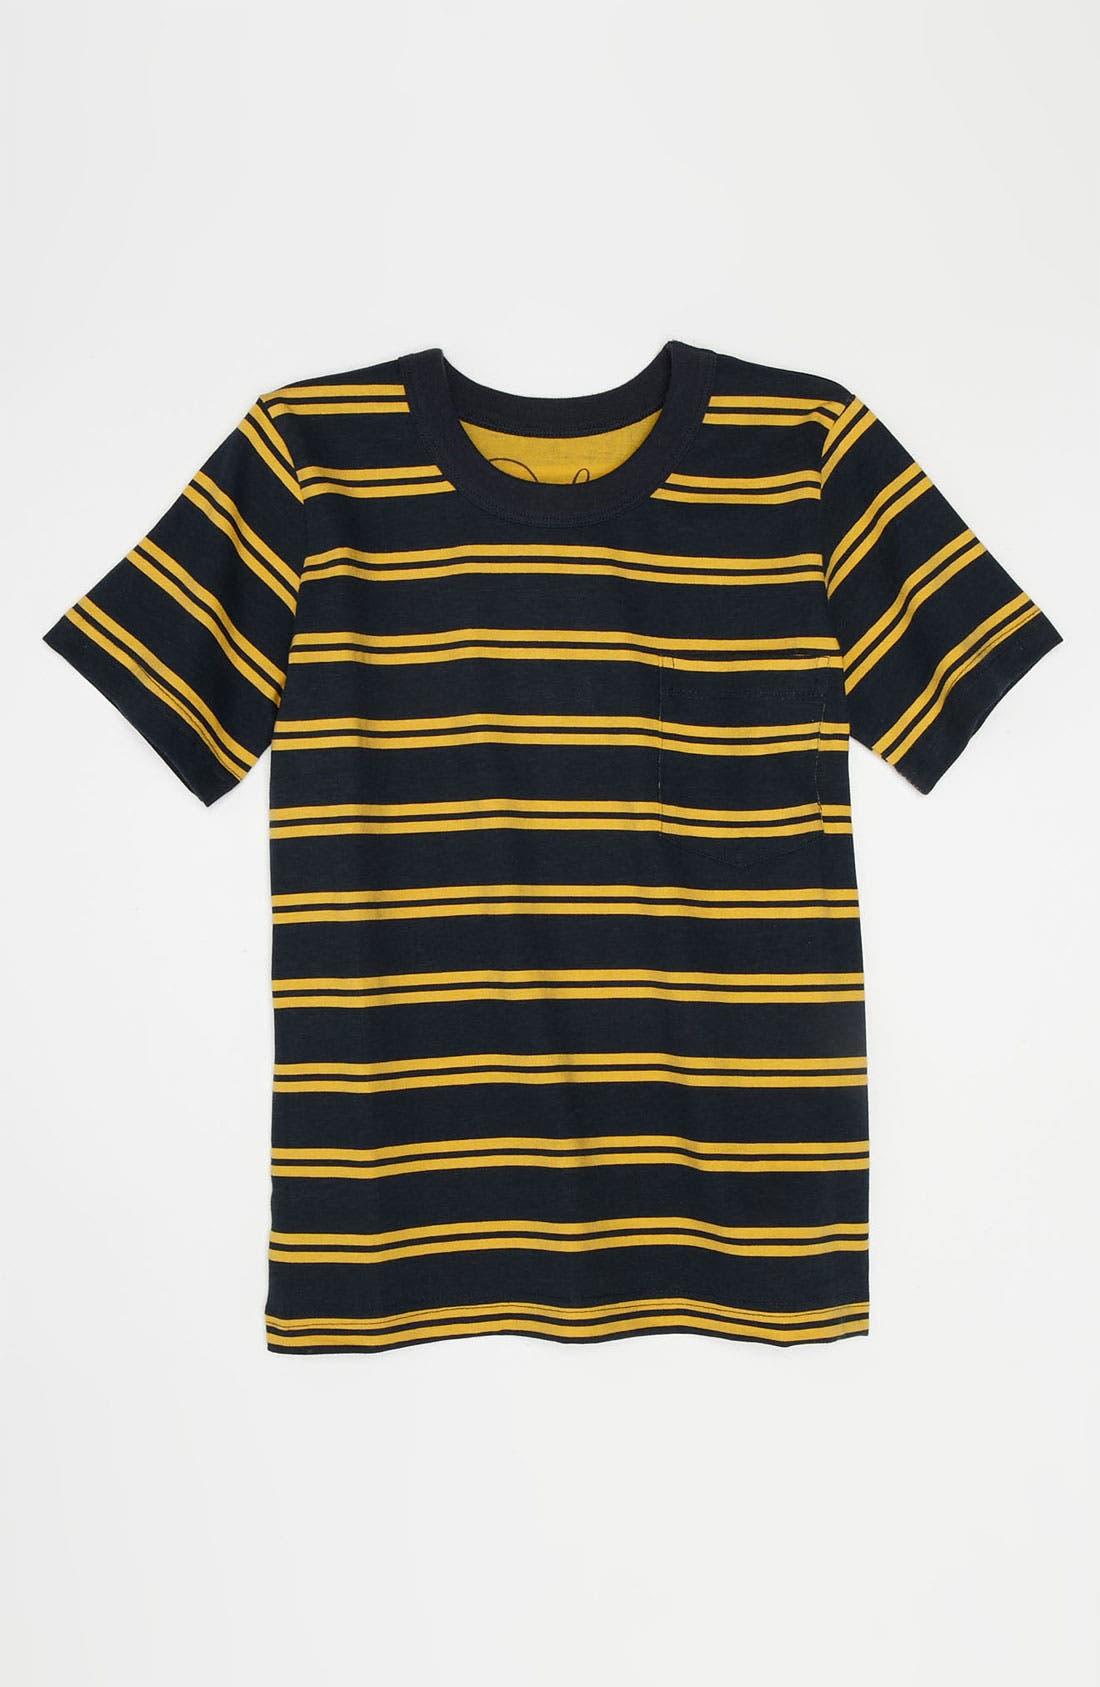 Alternate Image 1 Selected - Peek 'Simon' Stripe T-Shirt (Toddler, Little Boys & Big Boys)